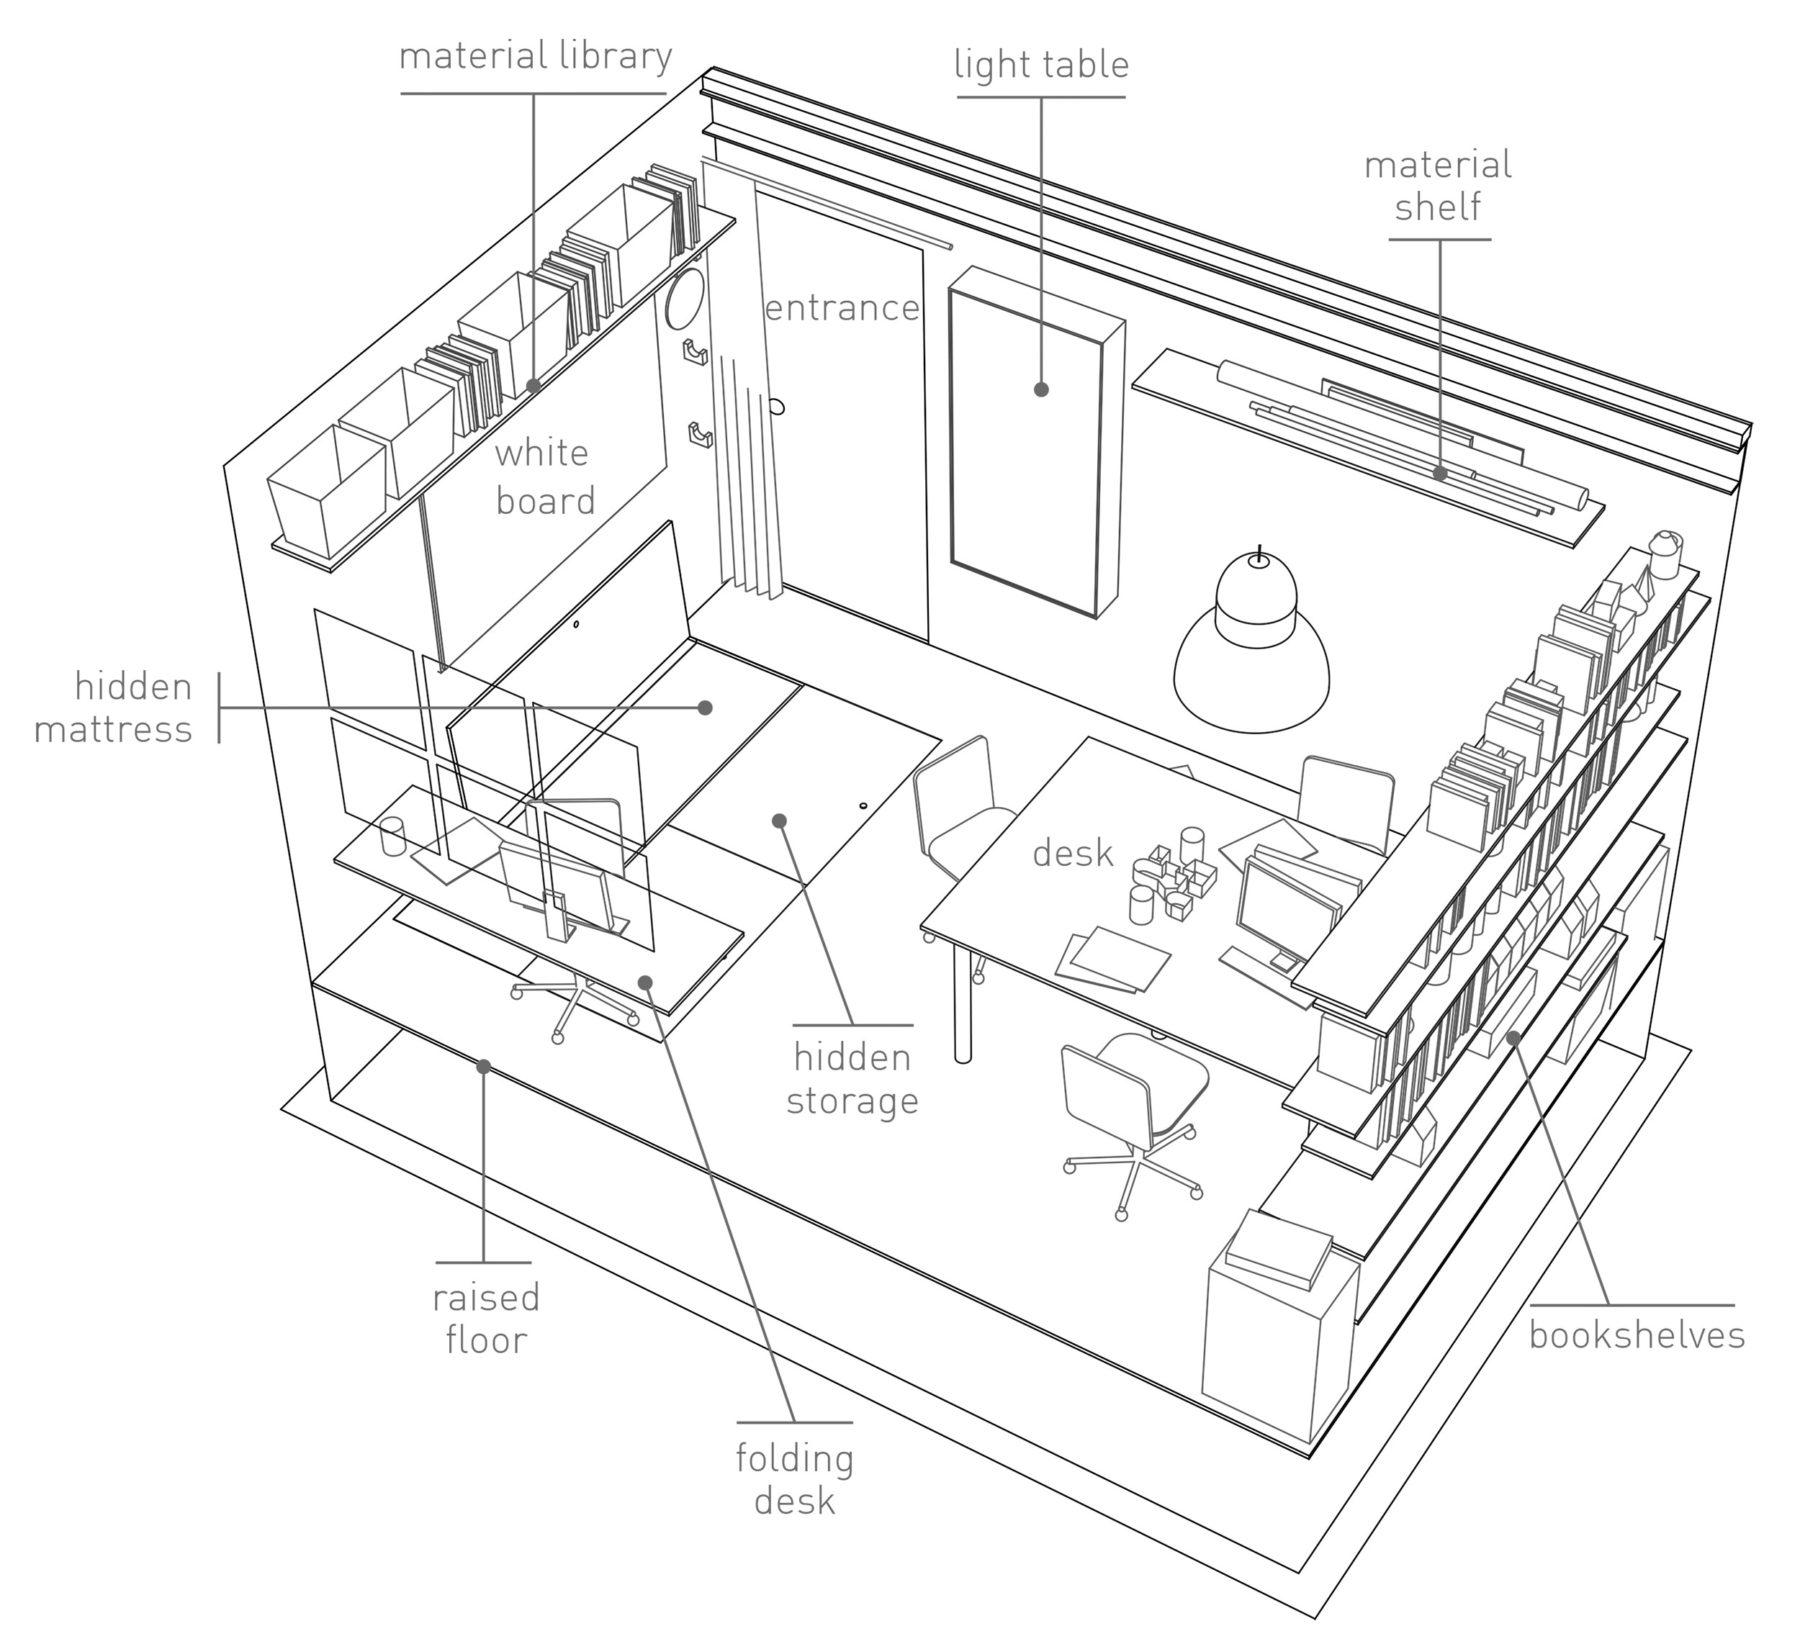 www.bold-design.fr - atelier sur les toits - perspective - picture by bold-design